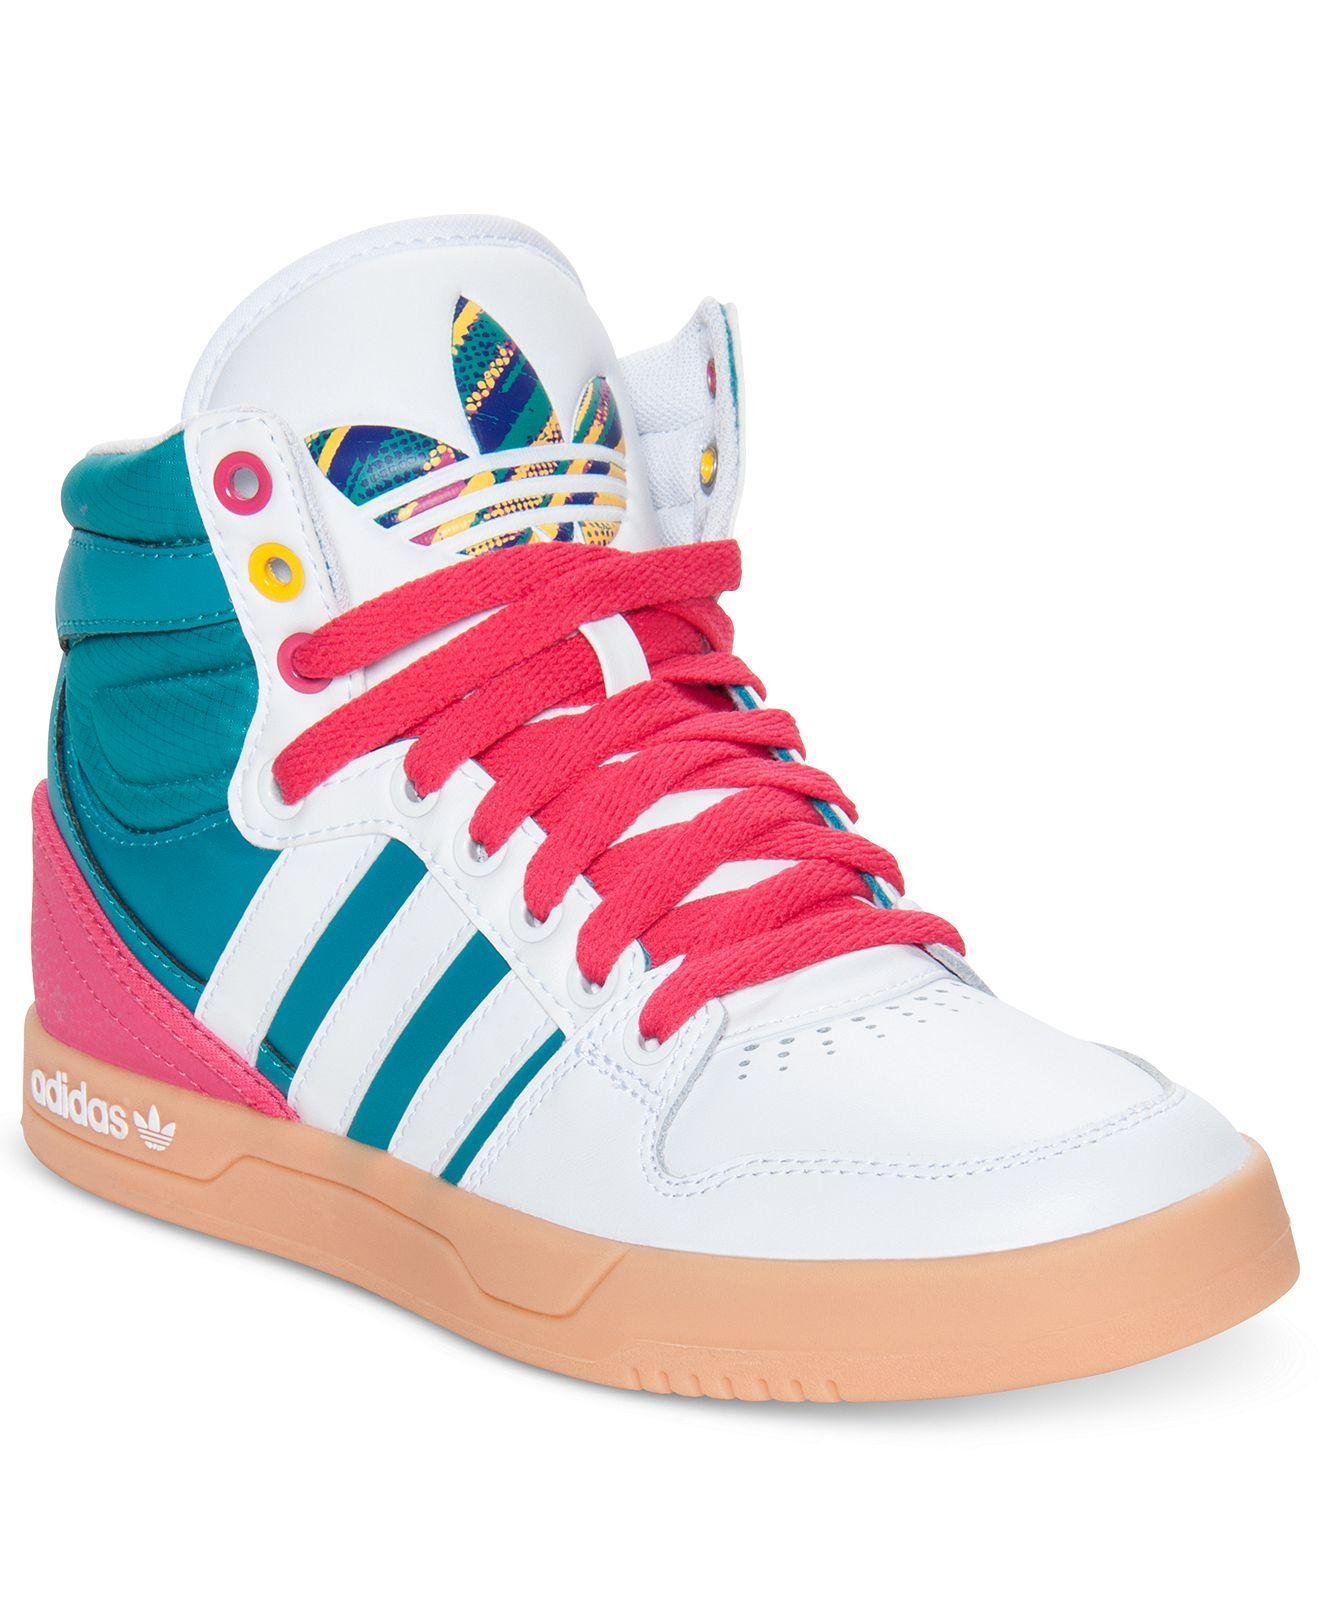 Adidas skate shoes zumiez - Adidas Women S Shoes Originals Court Attitude Casual Sneakers Kids Finish Line Athletic Shoes